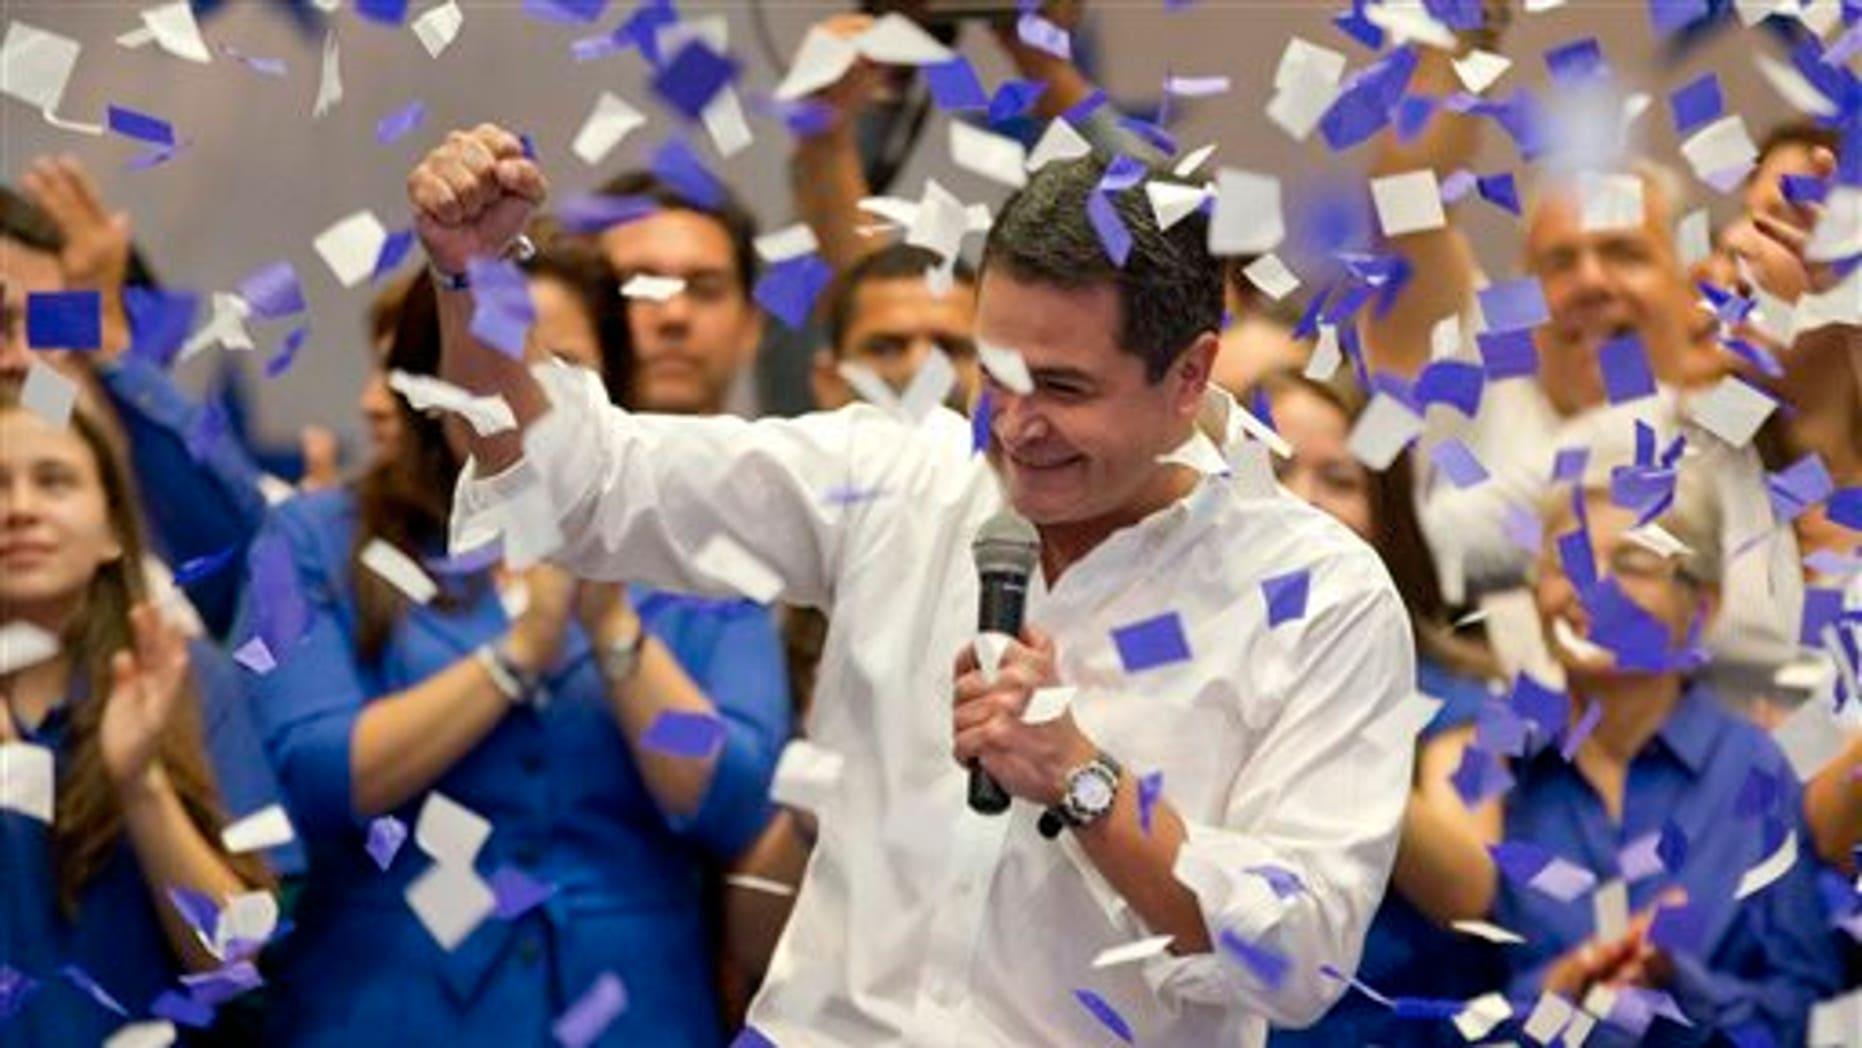 National Party's Juan Orlando Hernandez after partial election results in Tegucigalpa, Honduras, Sunday, Nov. 24, 2013.